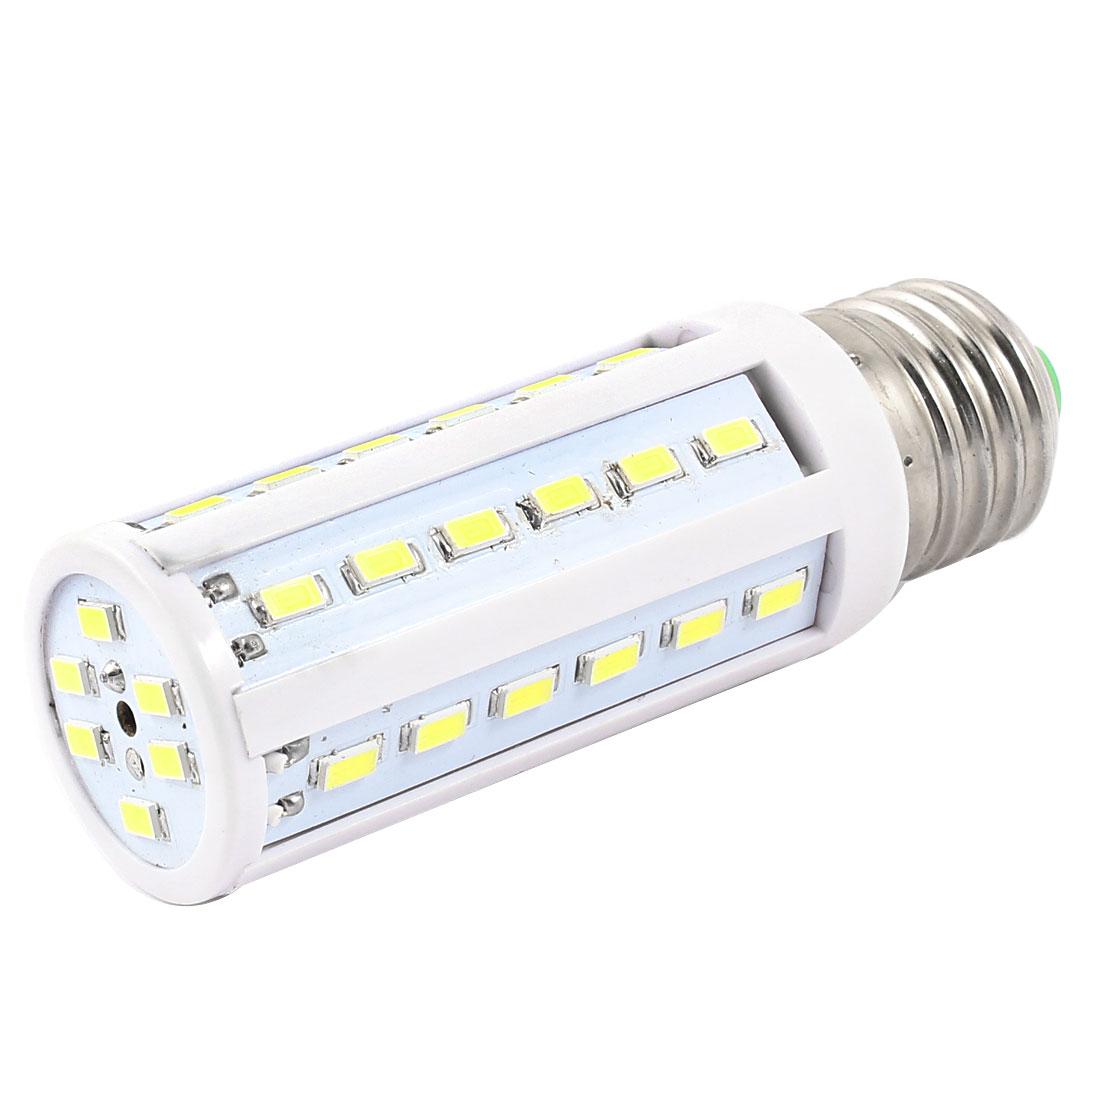 6000-6500K 10W Watt E27 Screw Base Pure White 42 SMD 5630 LED Light Bulb Lamp